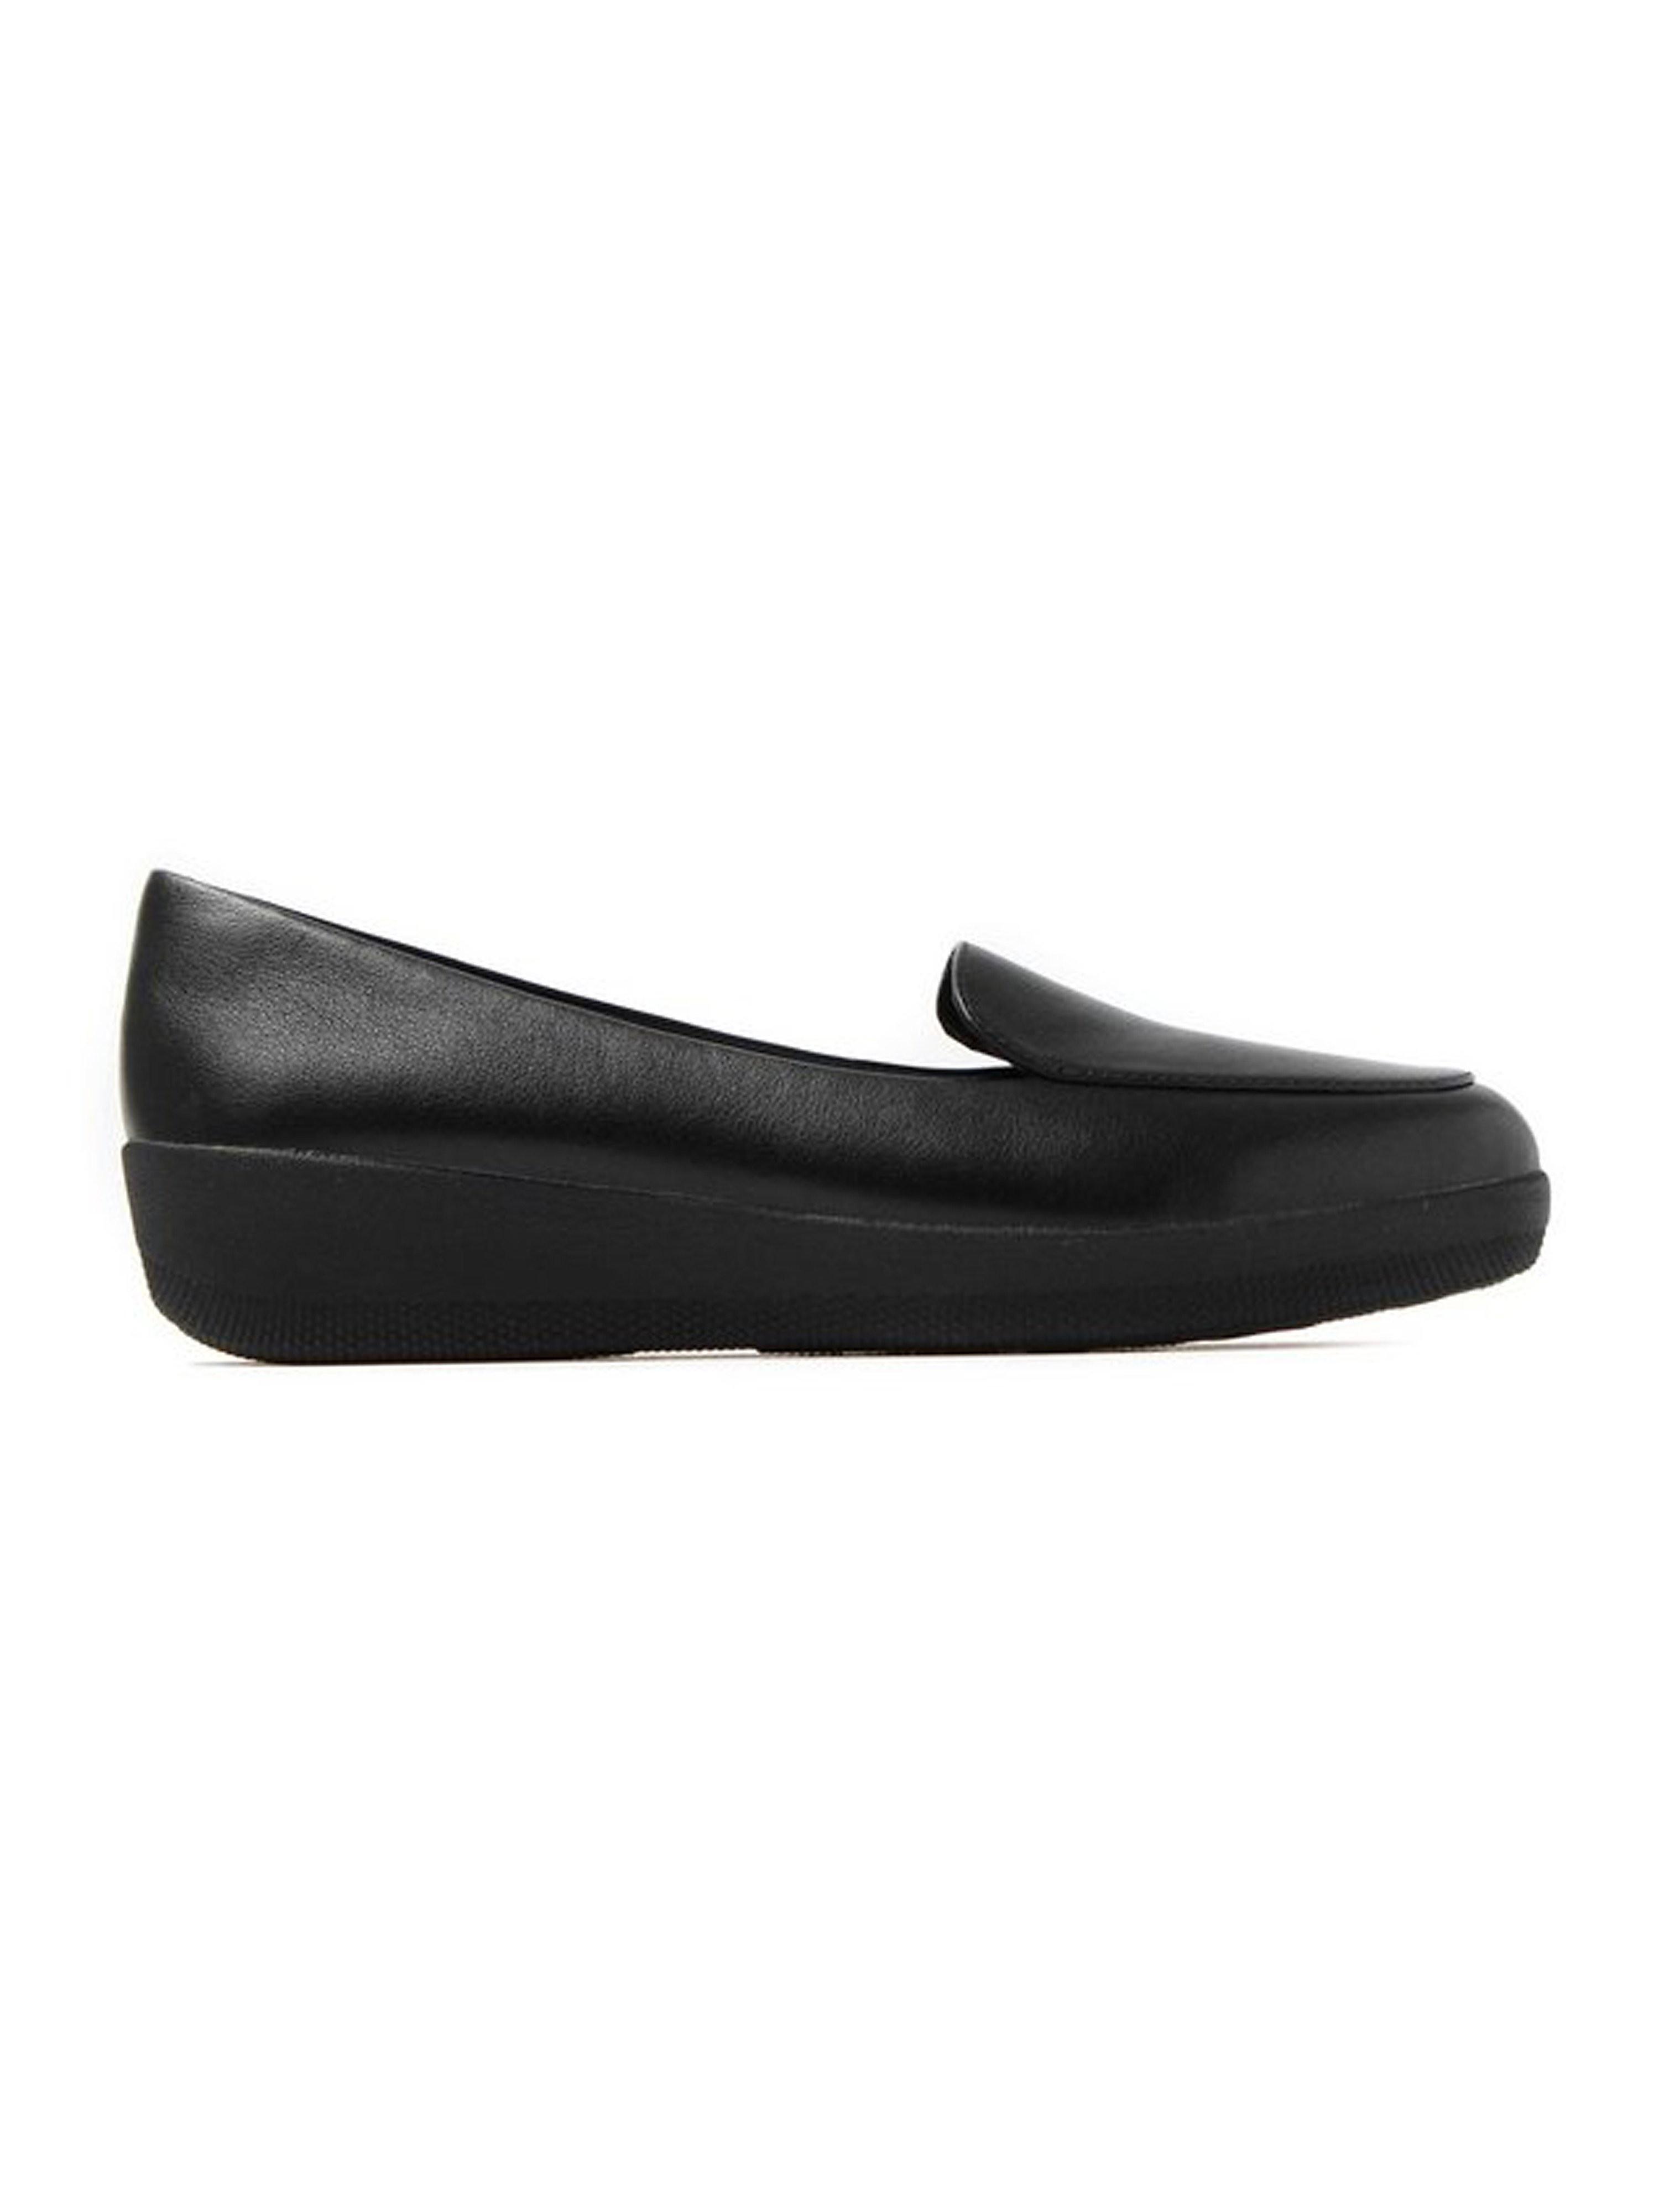 FitFlop Women's Sneaker Loafer – Black Leather